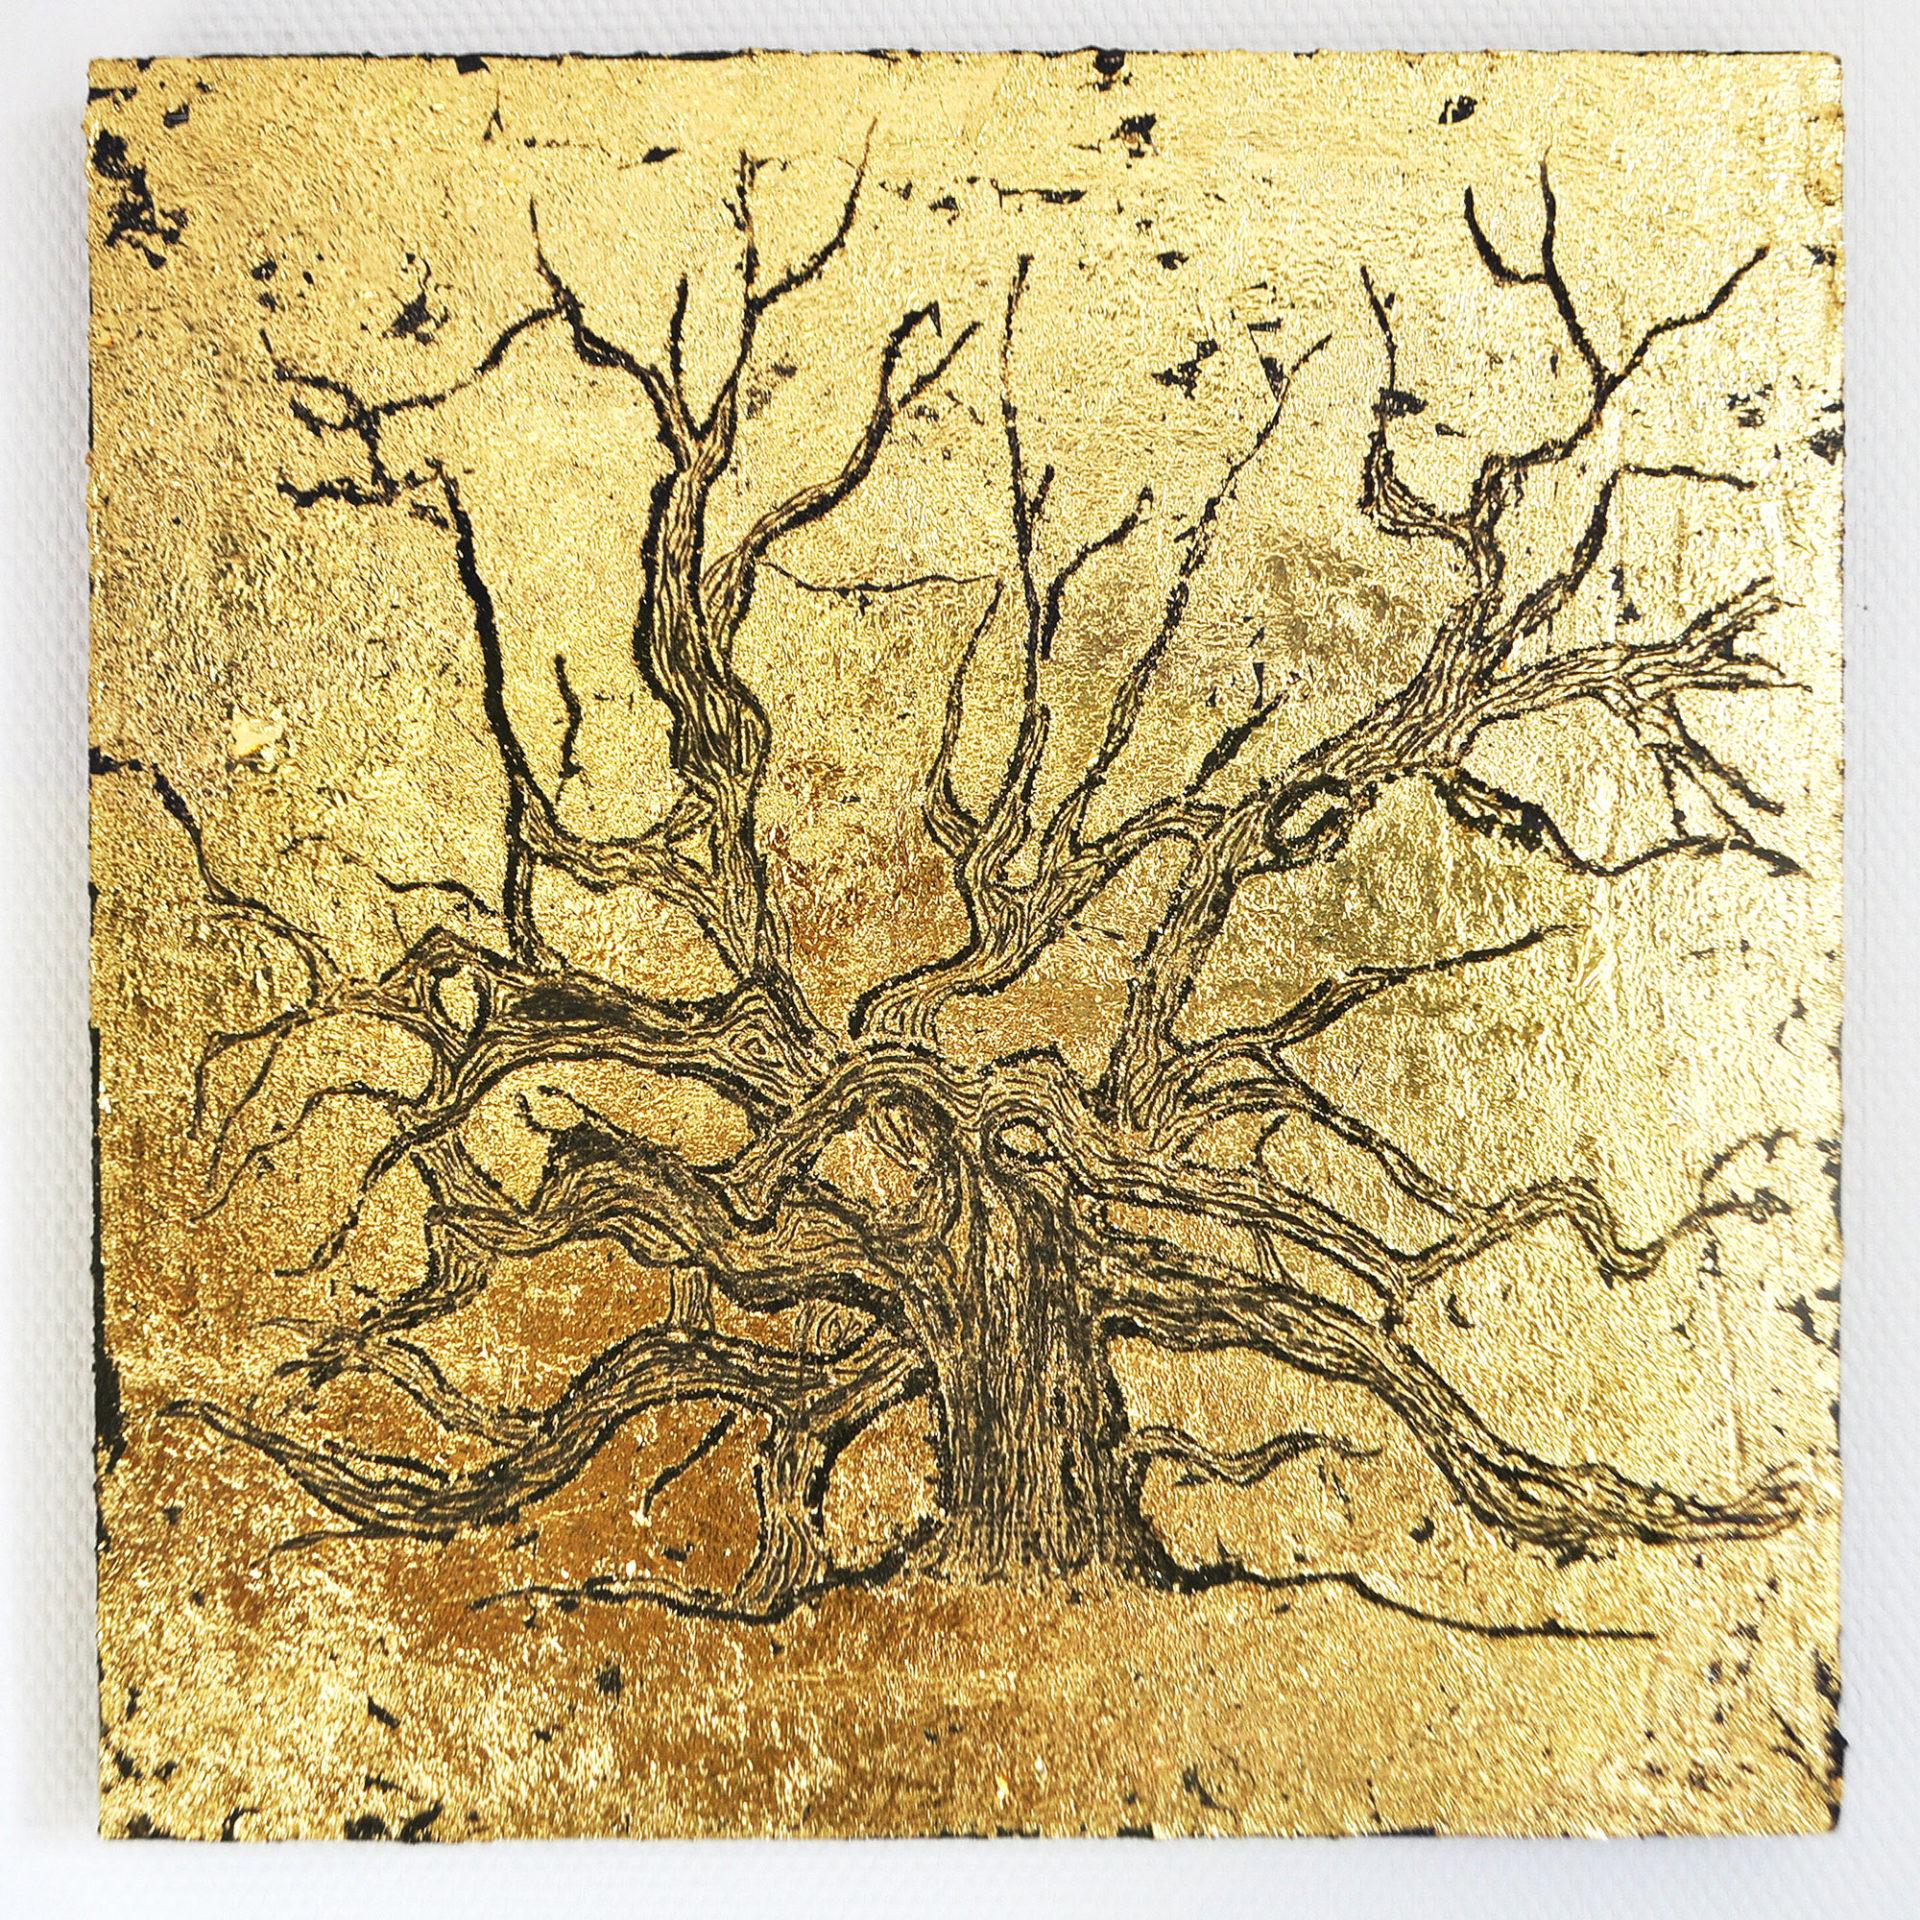 Baum-web